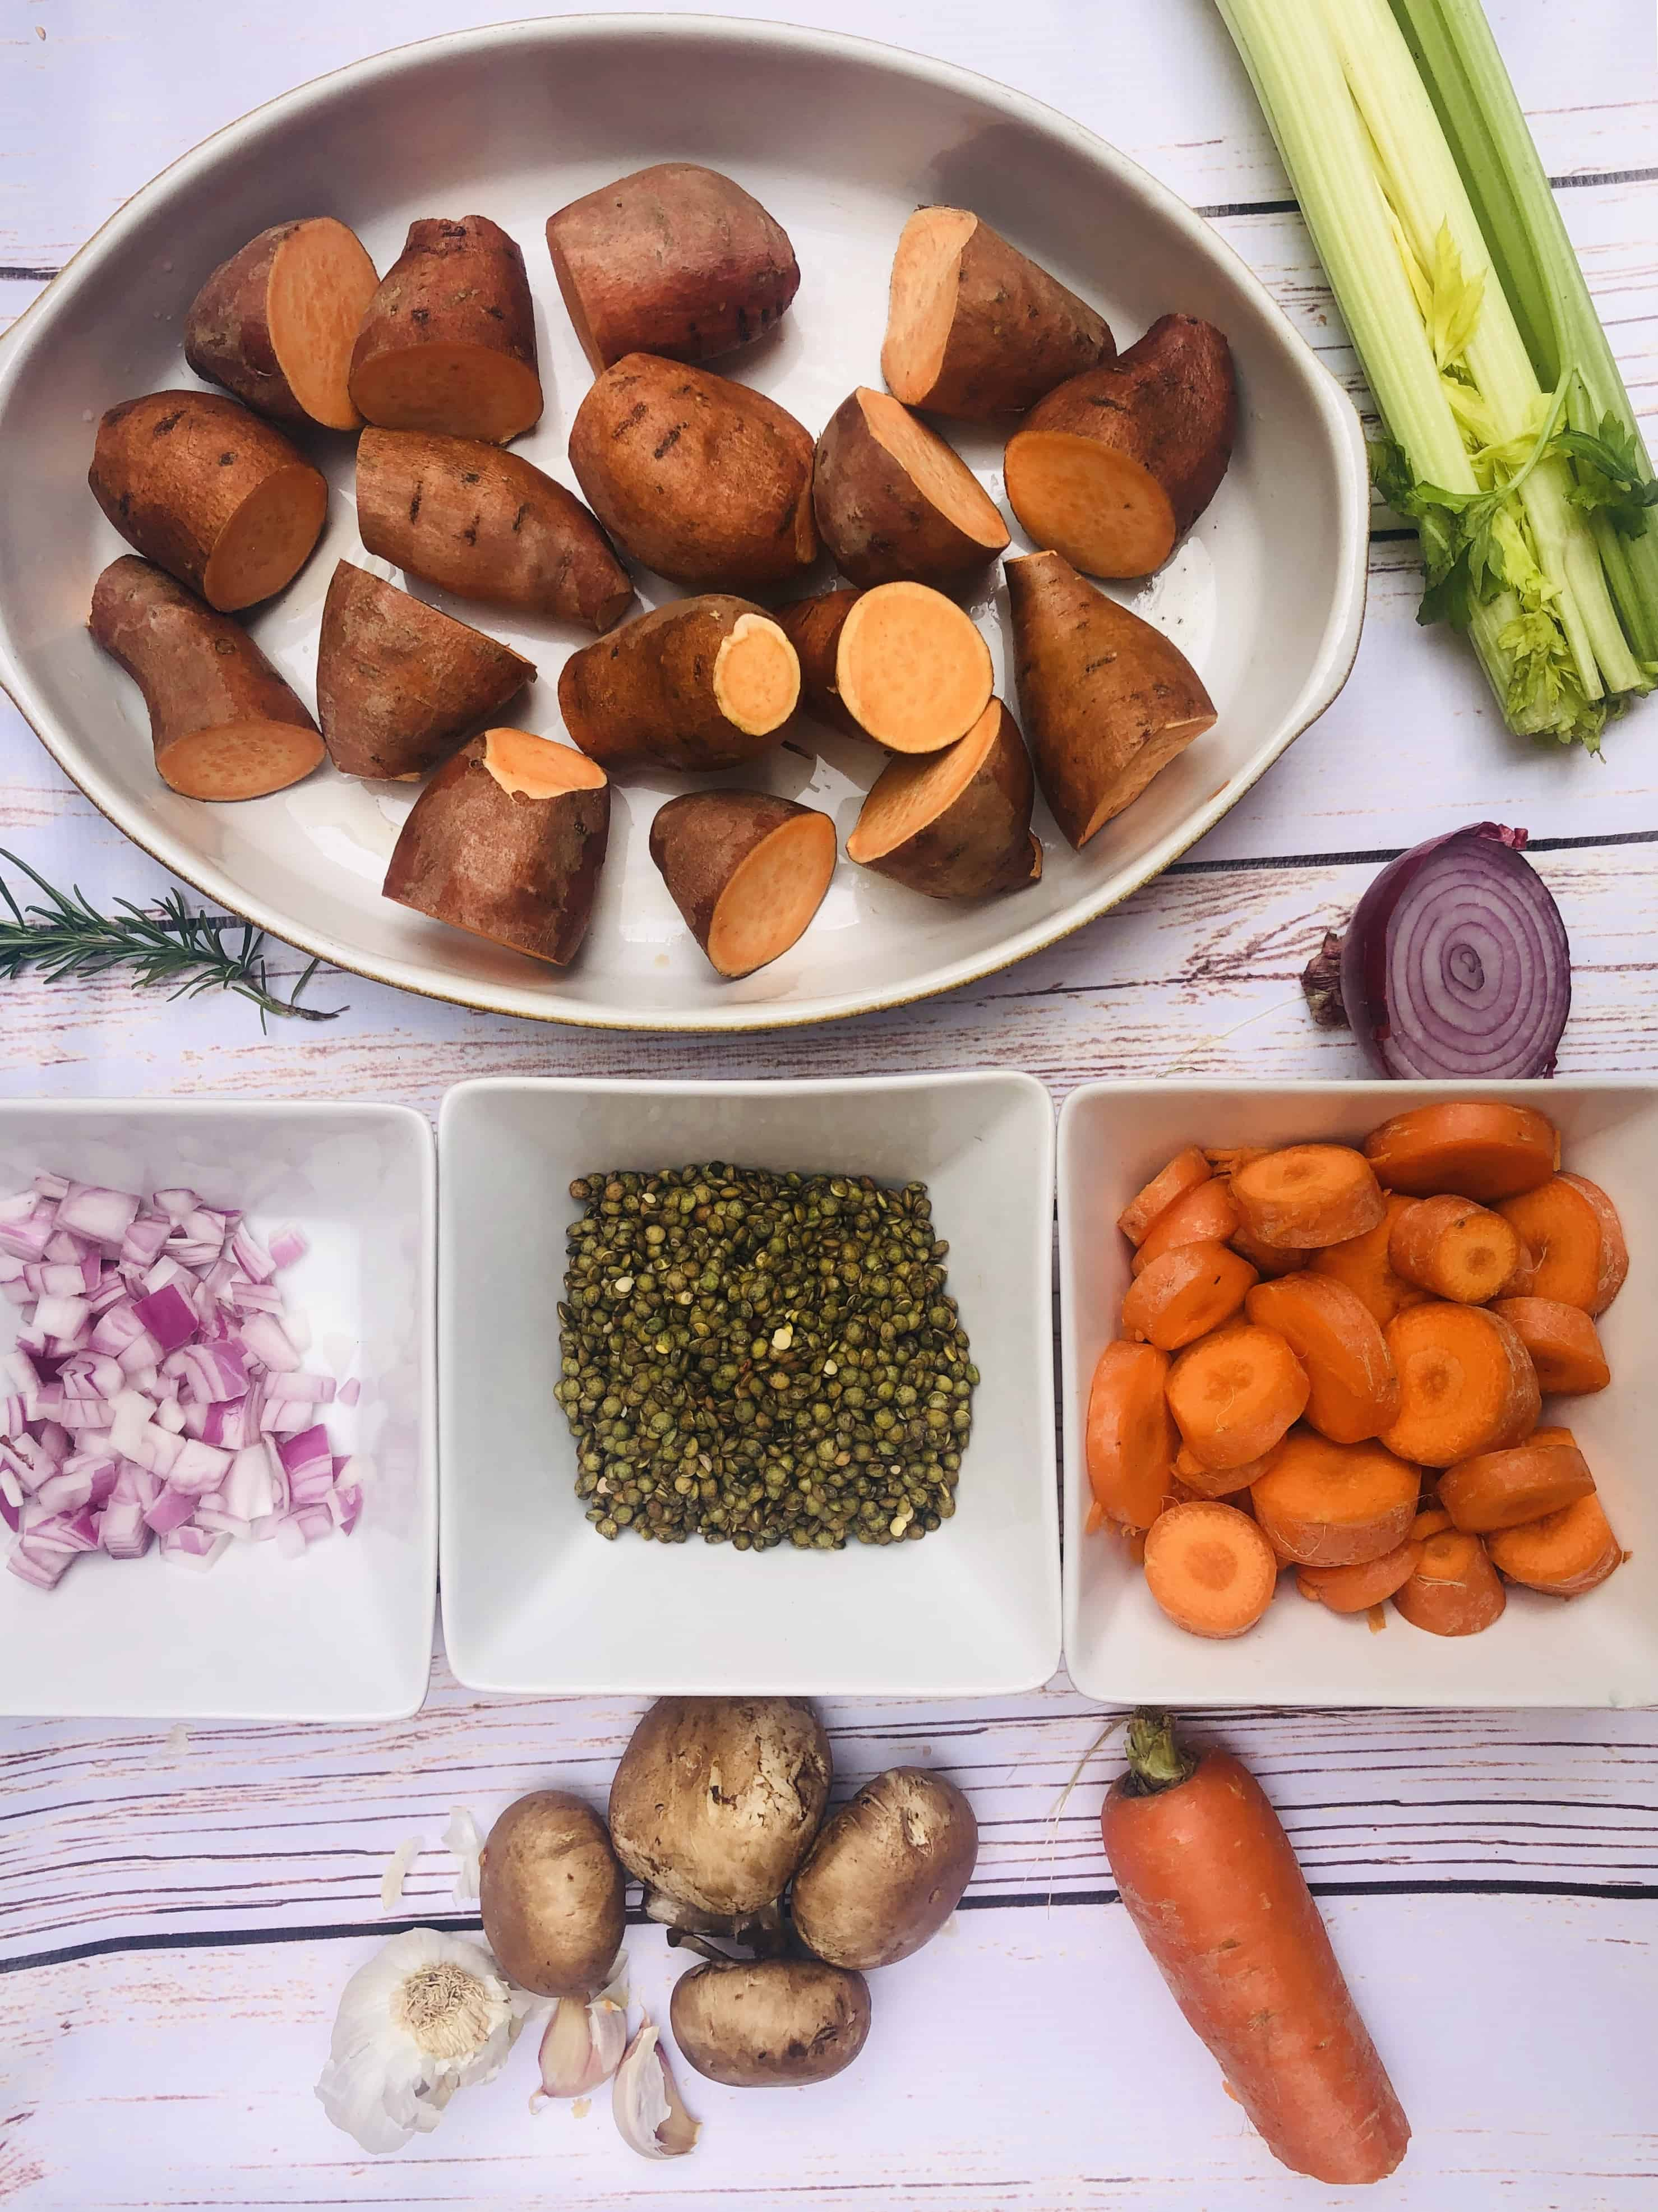 Vegan Lentil Bake Ingredients